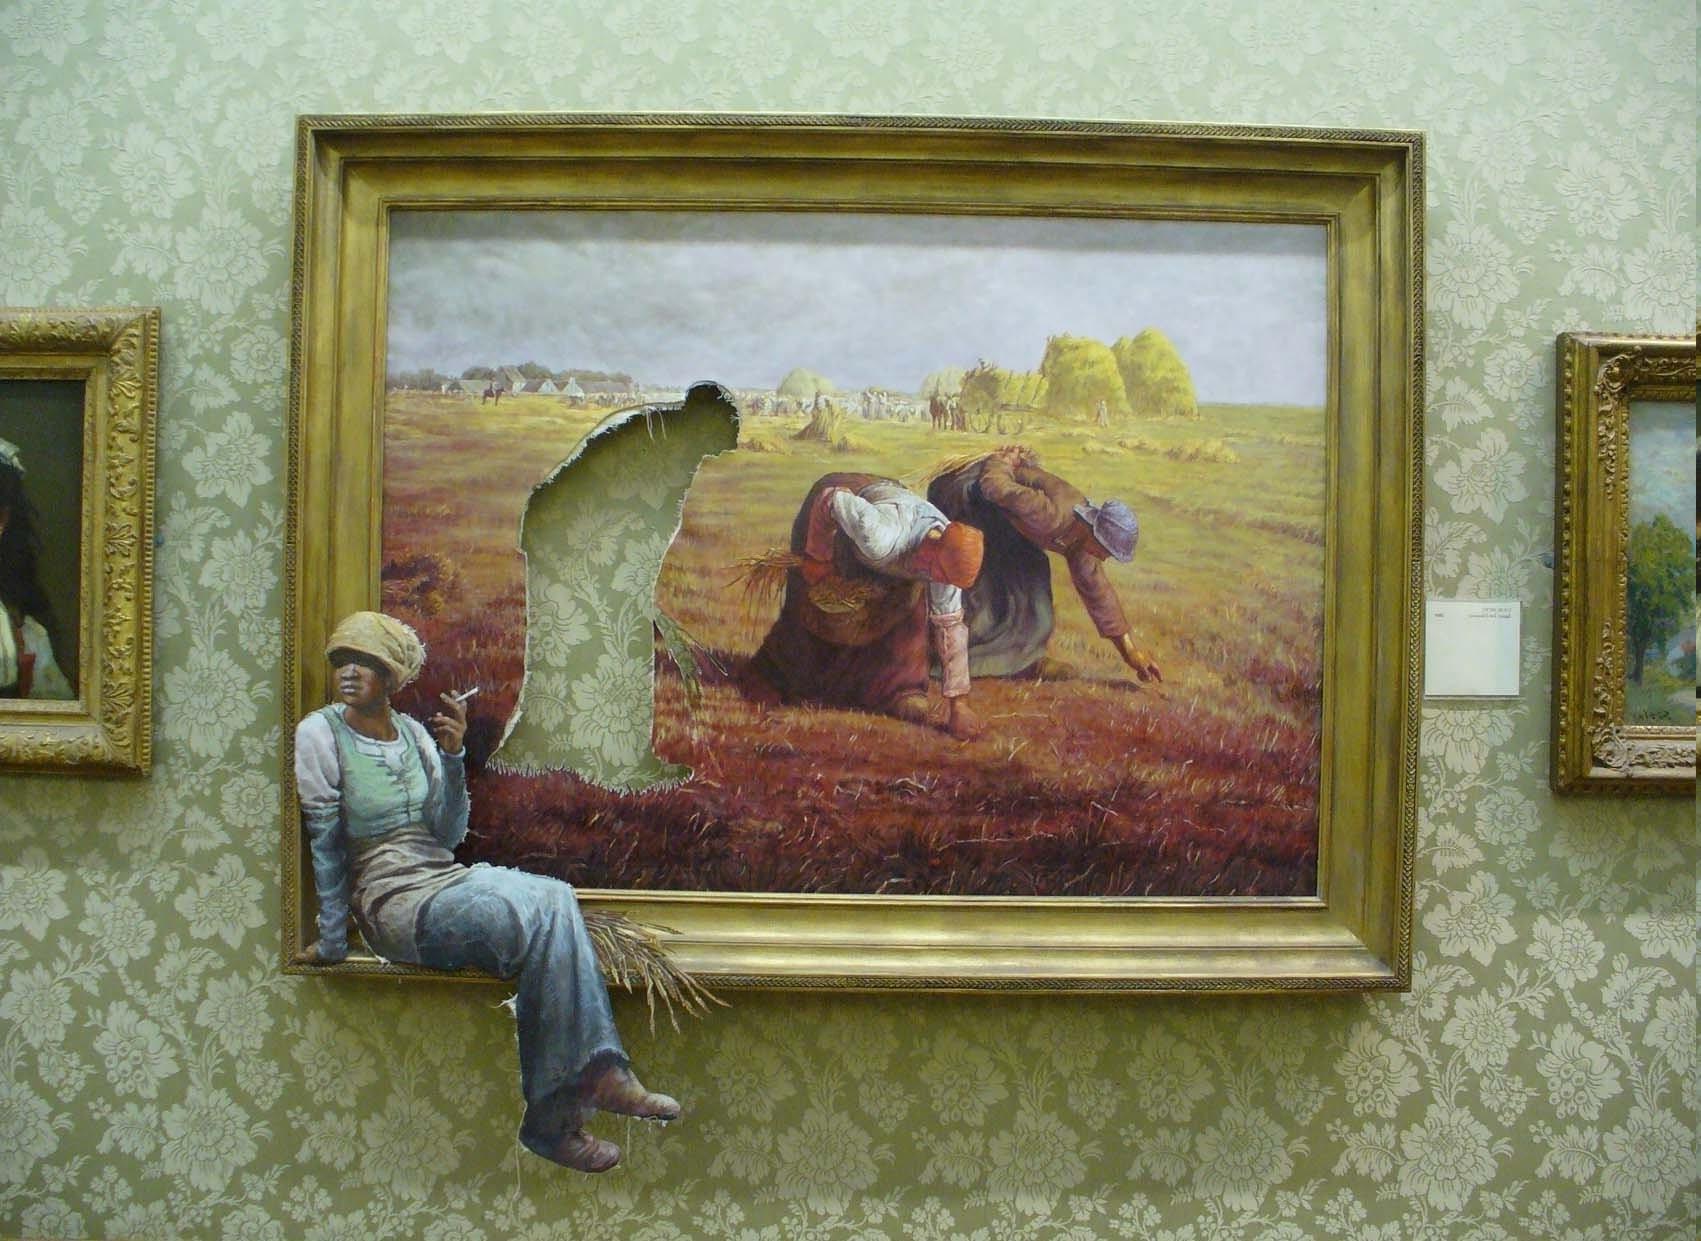 Hintergrundbilder : 1701x1241 px, Kunstwerk, Banksy, Galerien, Humor ...